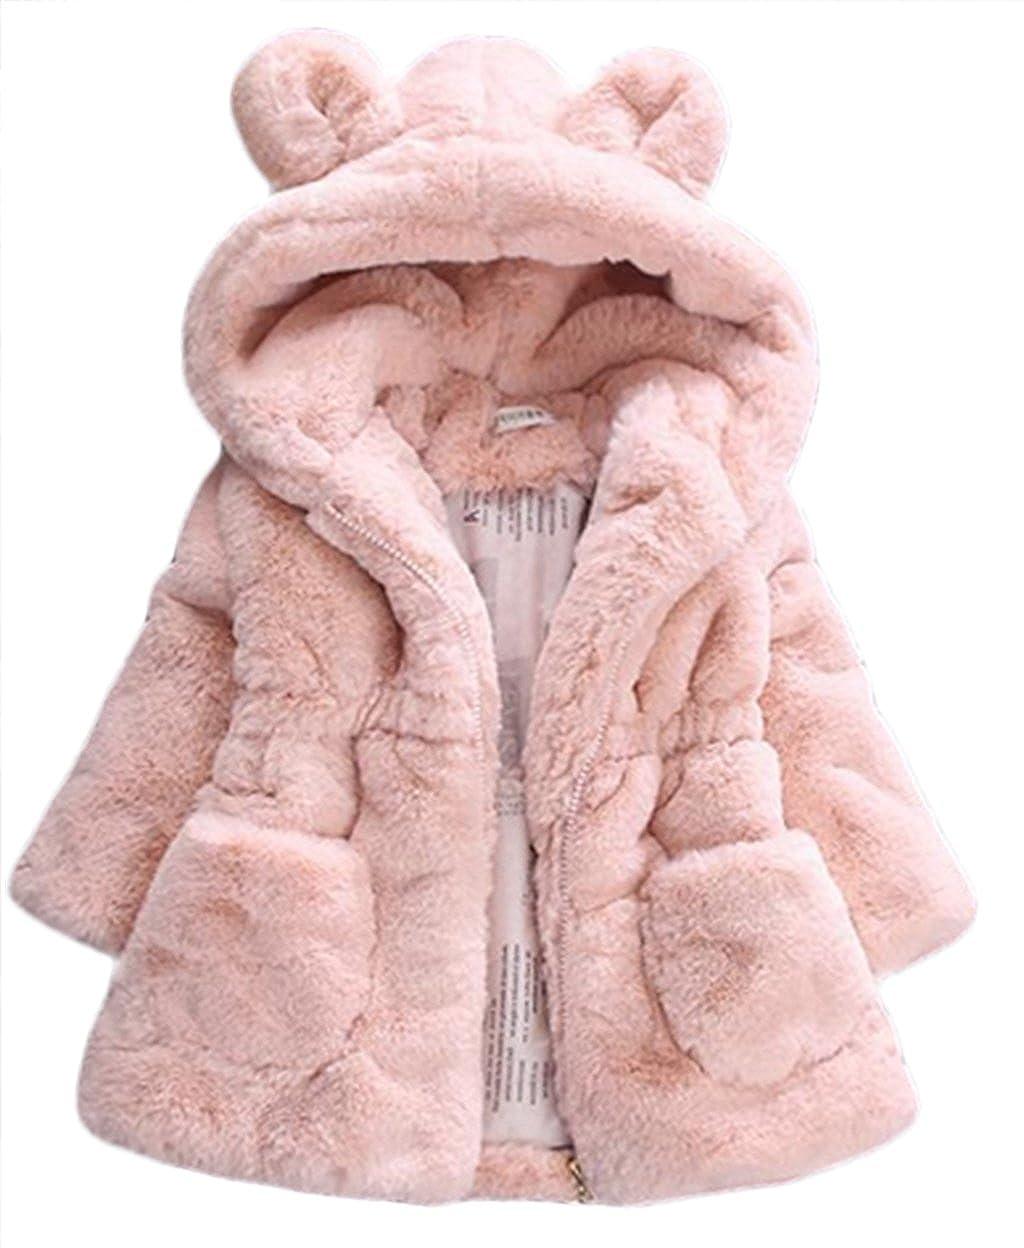 Kid Girls Fur 3D Cartoon Ear Hooded Coats Winter Thick Warm Jackets Outerwear BANGELY Z1113